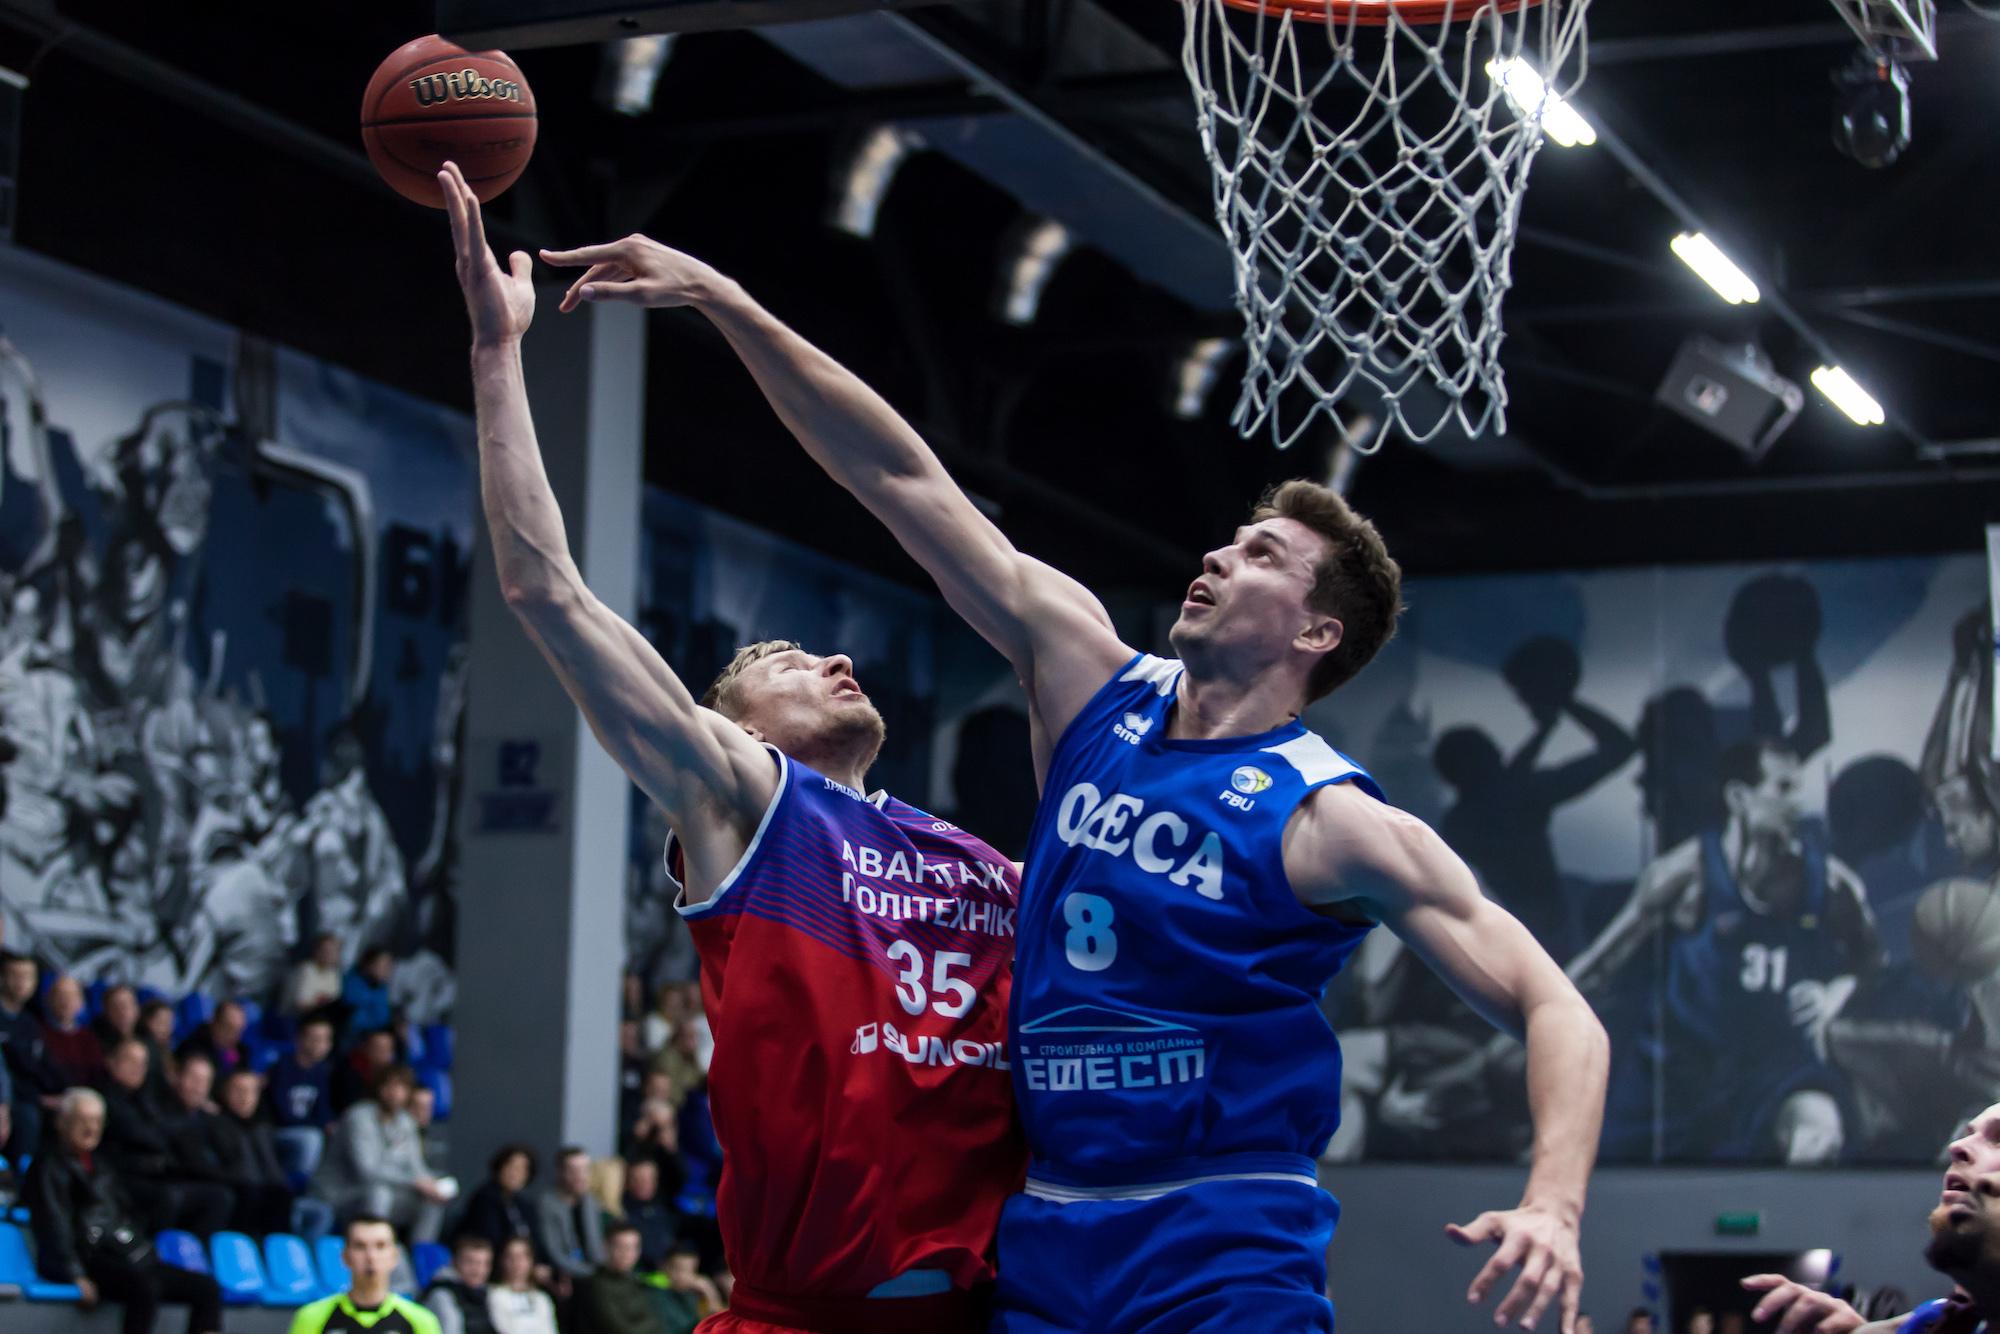 Одеса – перший фіналіст Кубку України